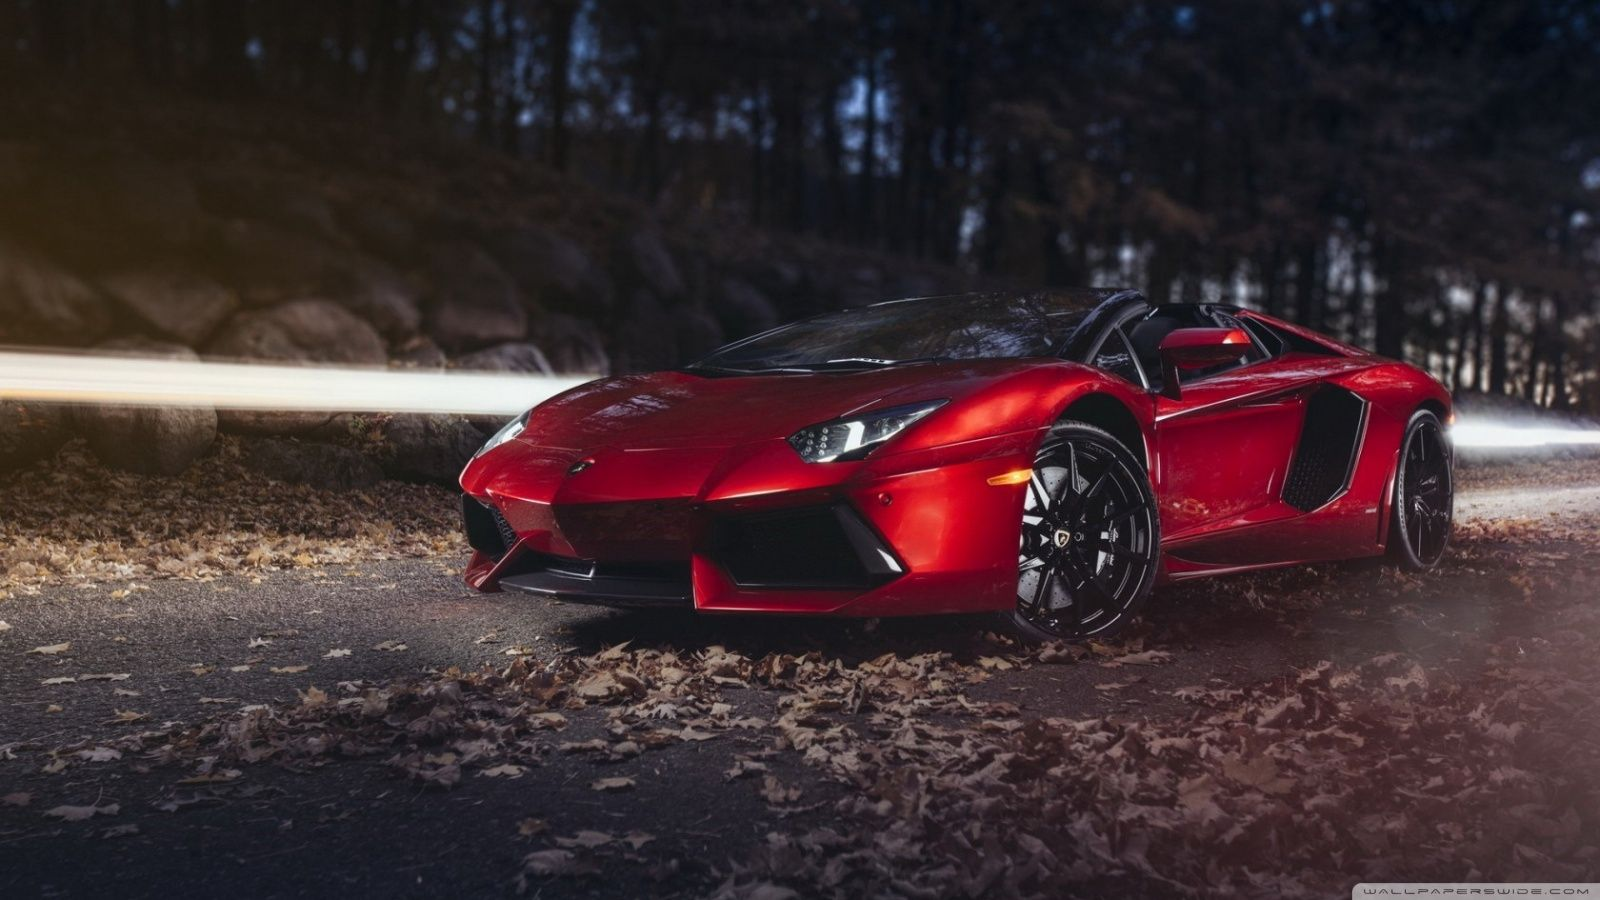 Red Lamborghini Car Hd Wallpaper